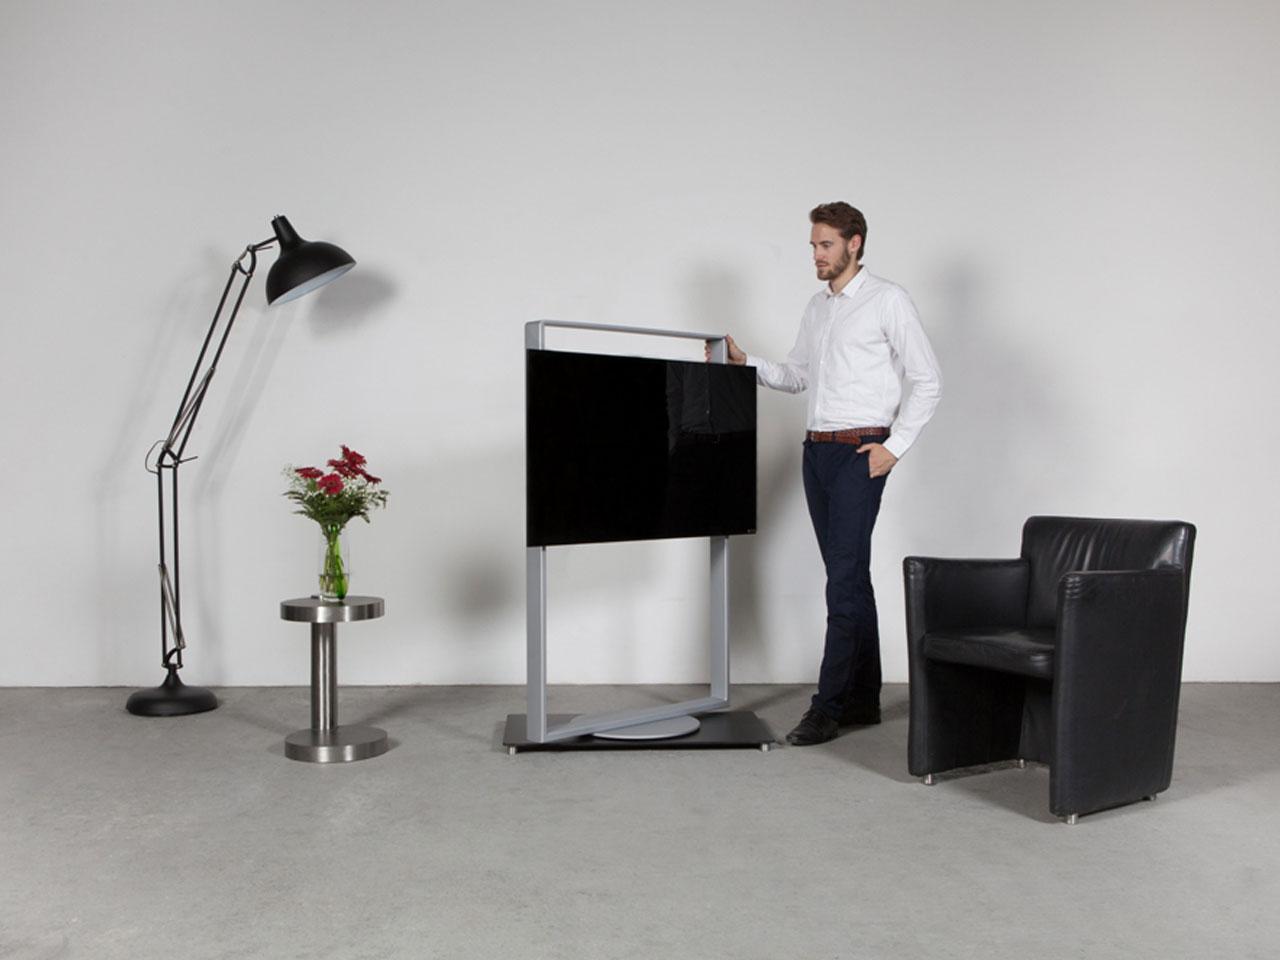 Charmant Bilderrahmen Tv Zeitgenössisch - Bilderrahmen Ideen ...